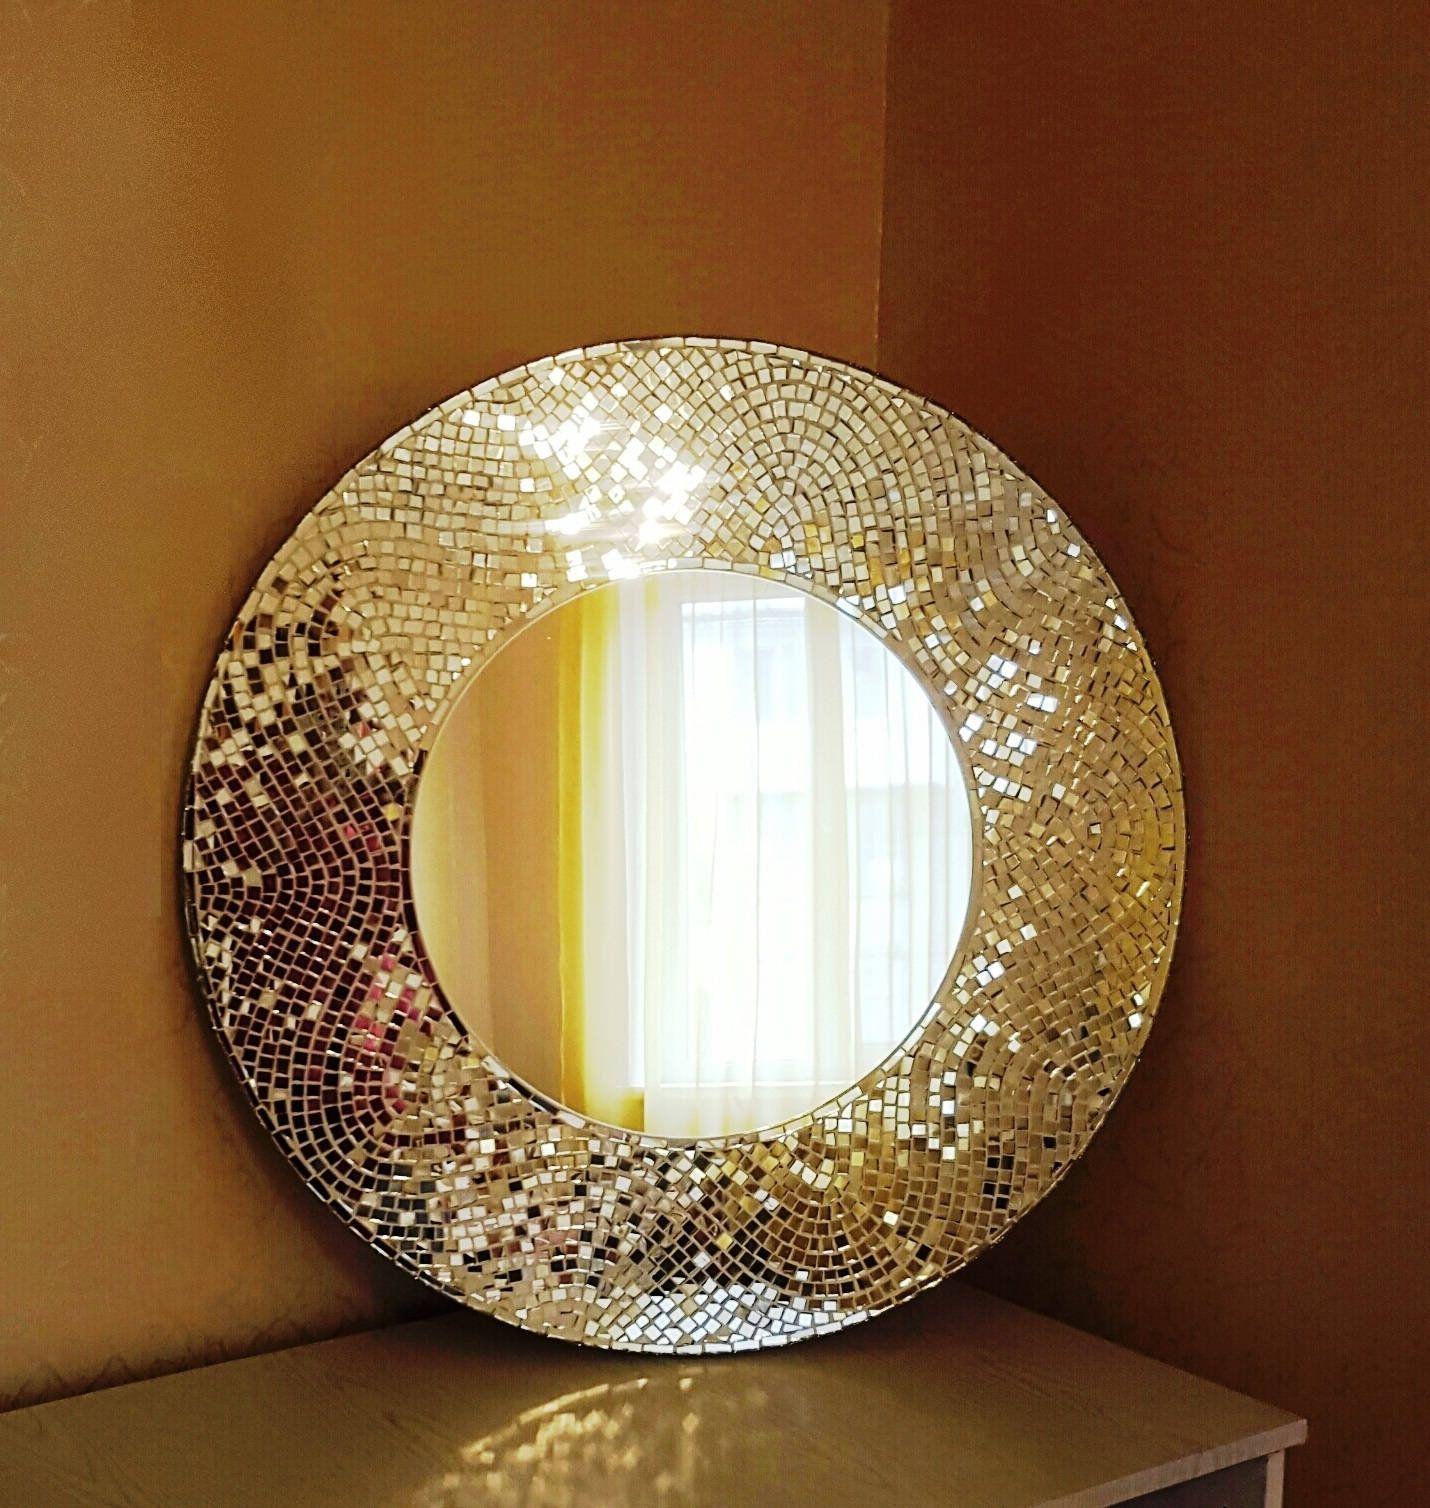 Large Round Mirror Decorative Mosaic Mirror Made To Order Mirror Wall Decor Modern Mirror Wall Glass Mosaic Mirror